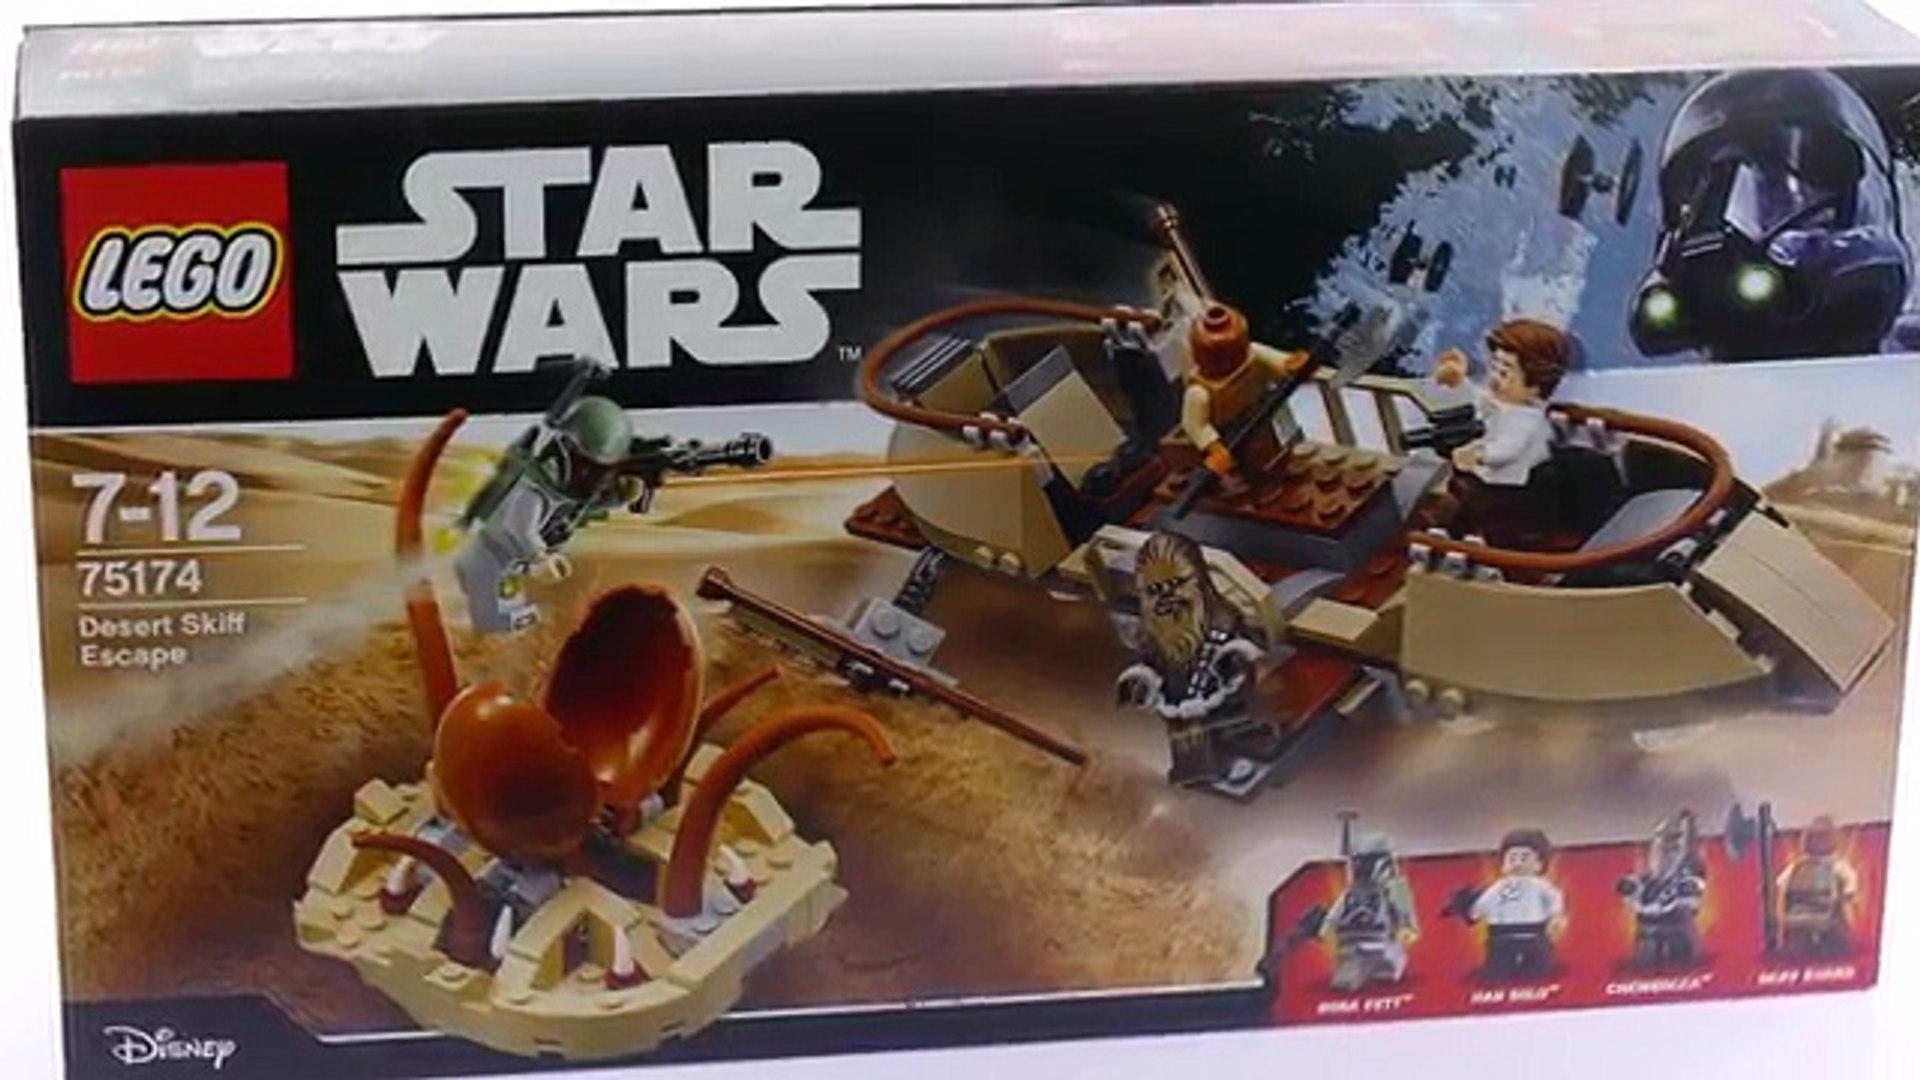 LEGO ® Star Wars Set 75174//Desert Skiff Escape